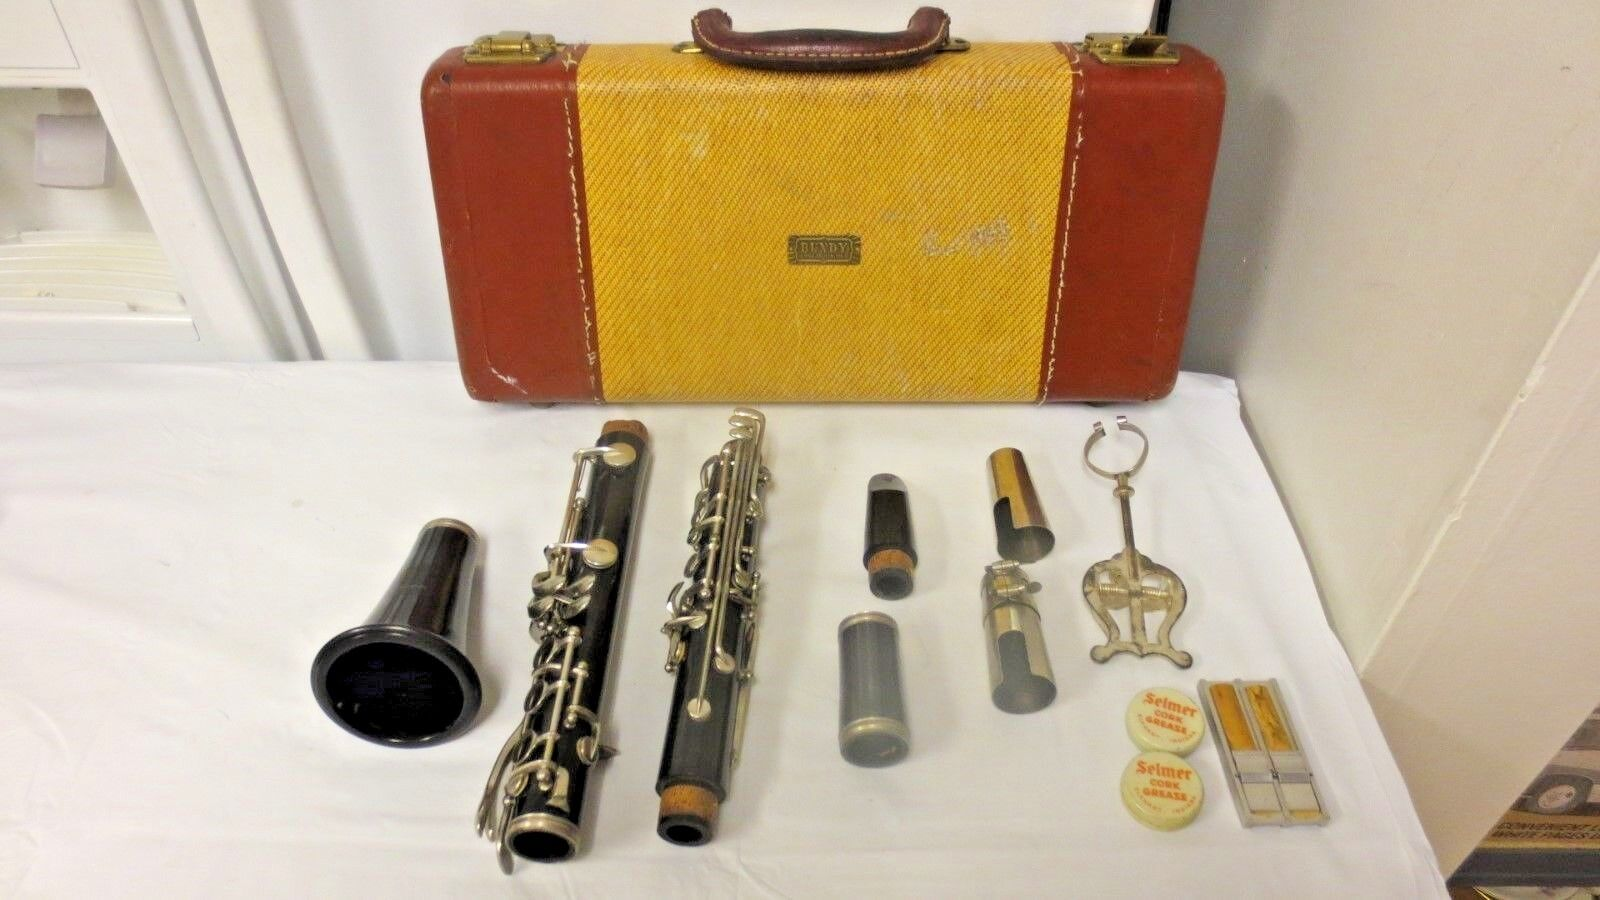 Selmar Bundy Resonite Clarinet-selmer Goldentone Mouthpiece-case-accessories